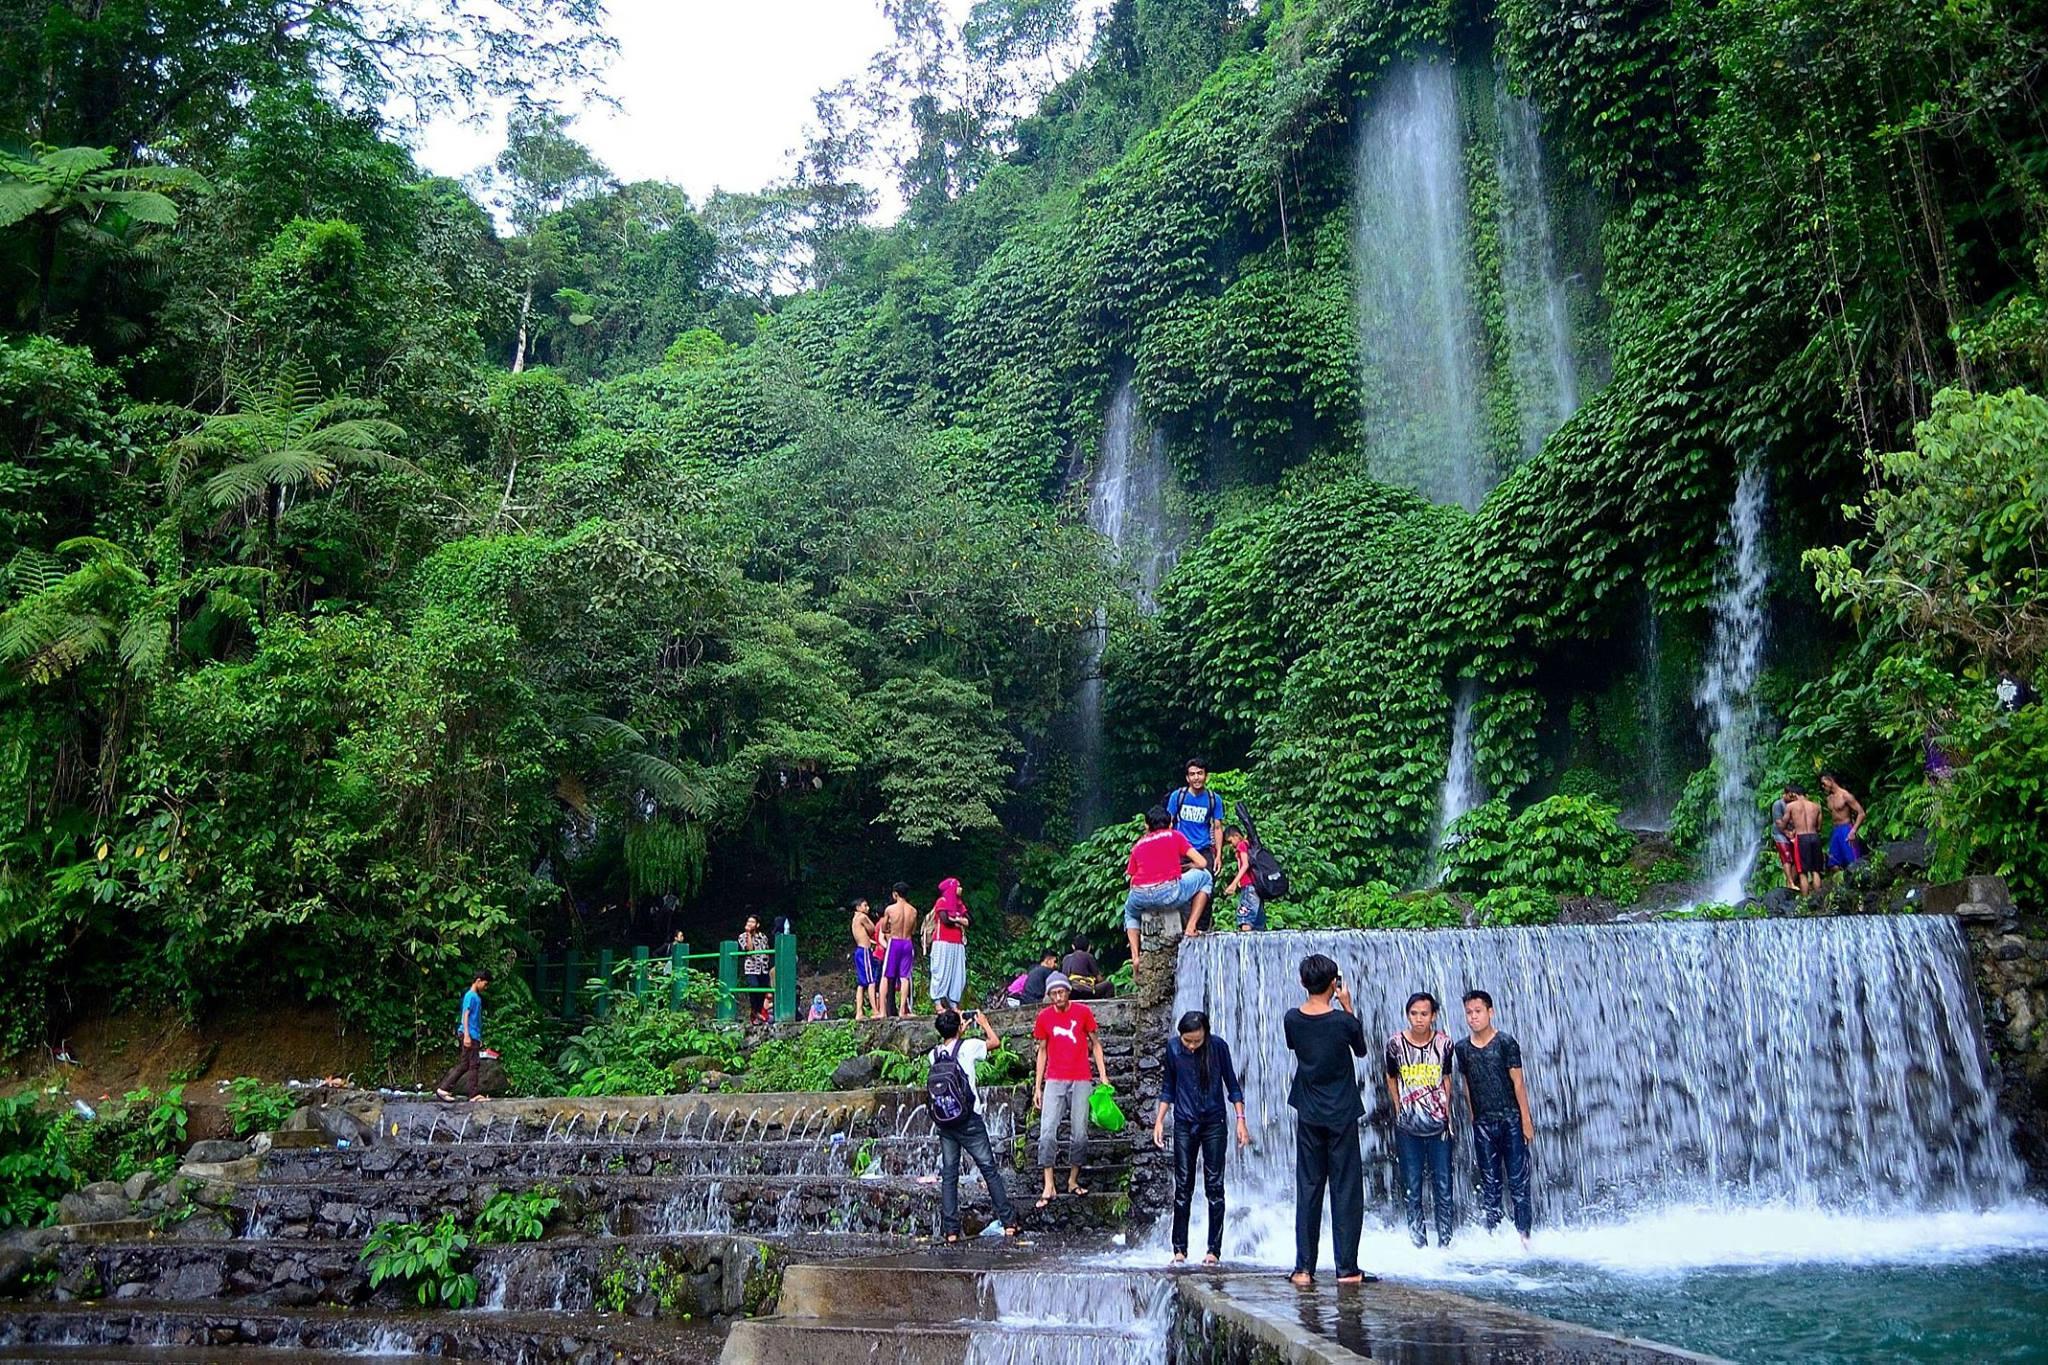 Gemercik Air Terjun Benang Kelambu, Lombok Halaman all